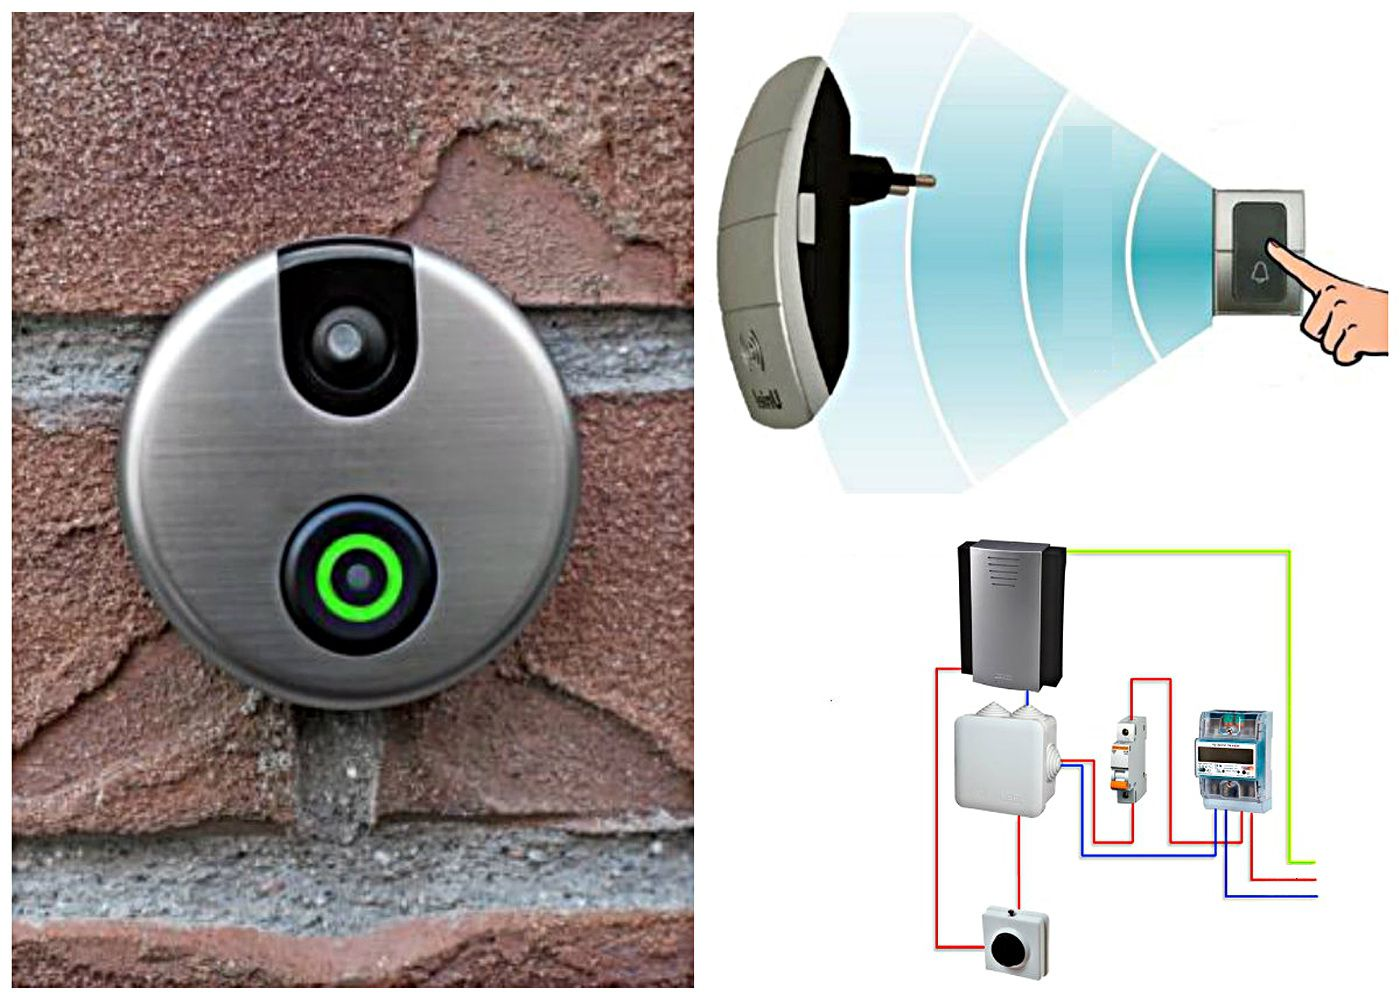 principle of operation of the wireless door bell